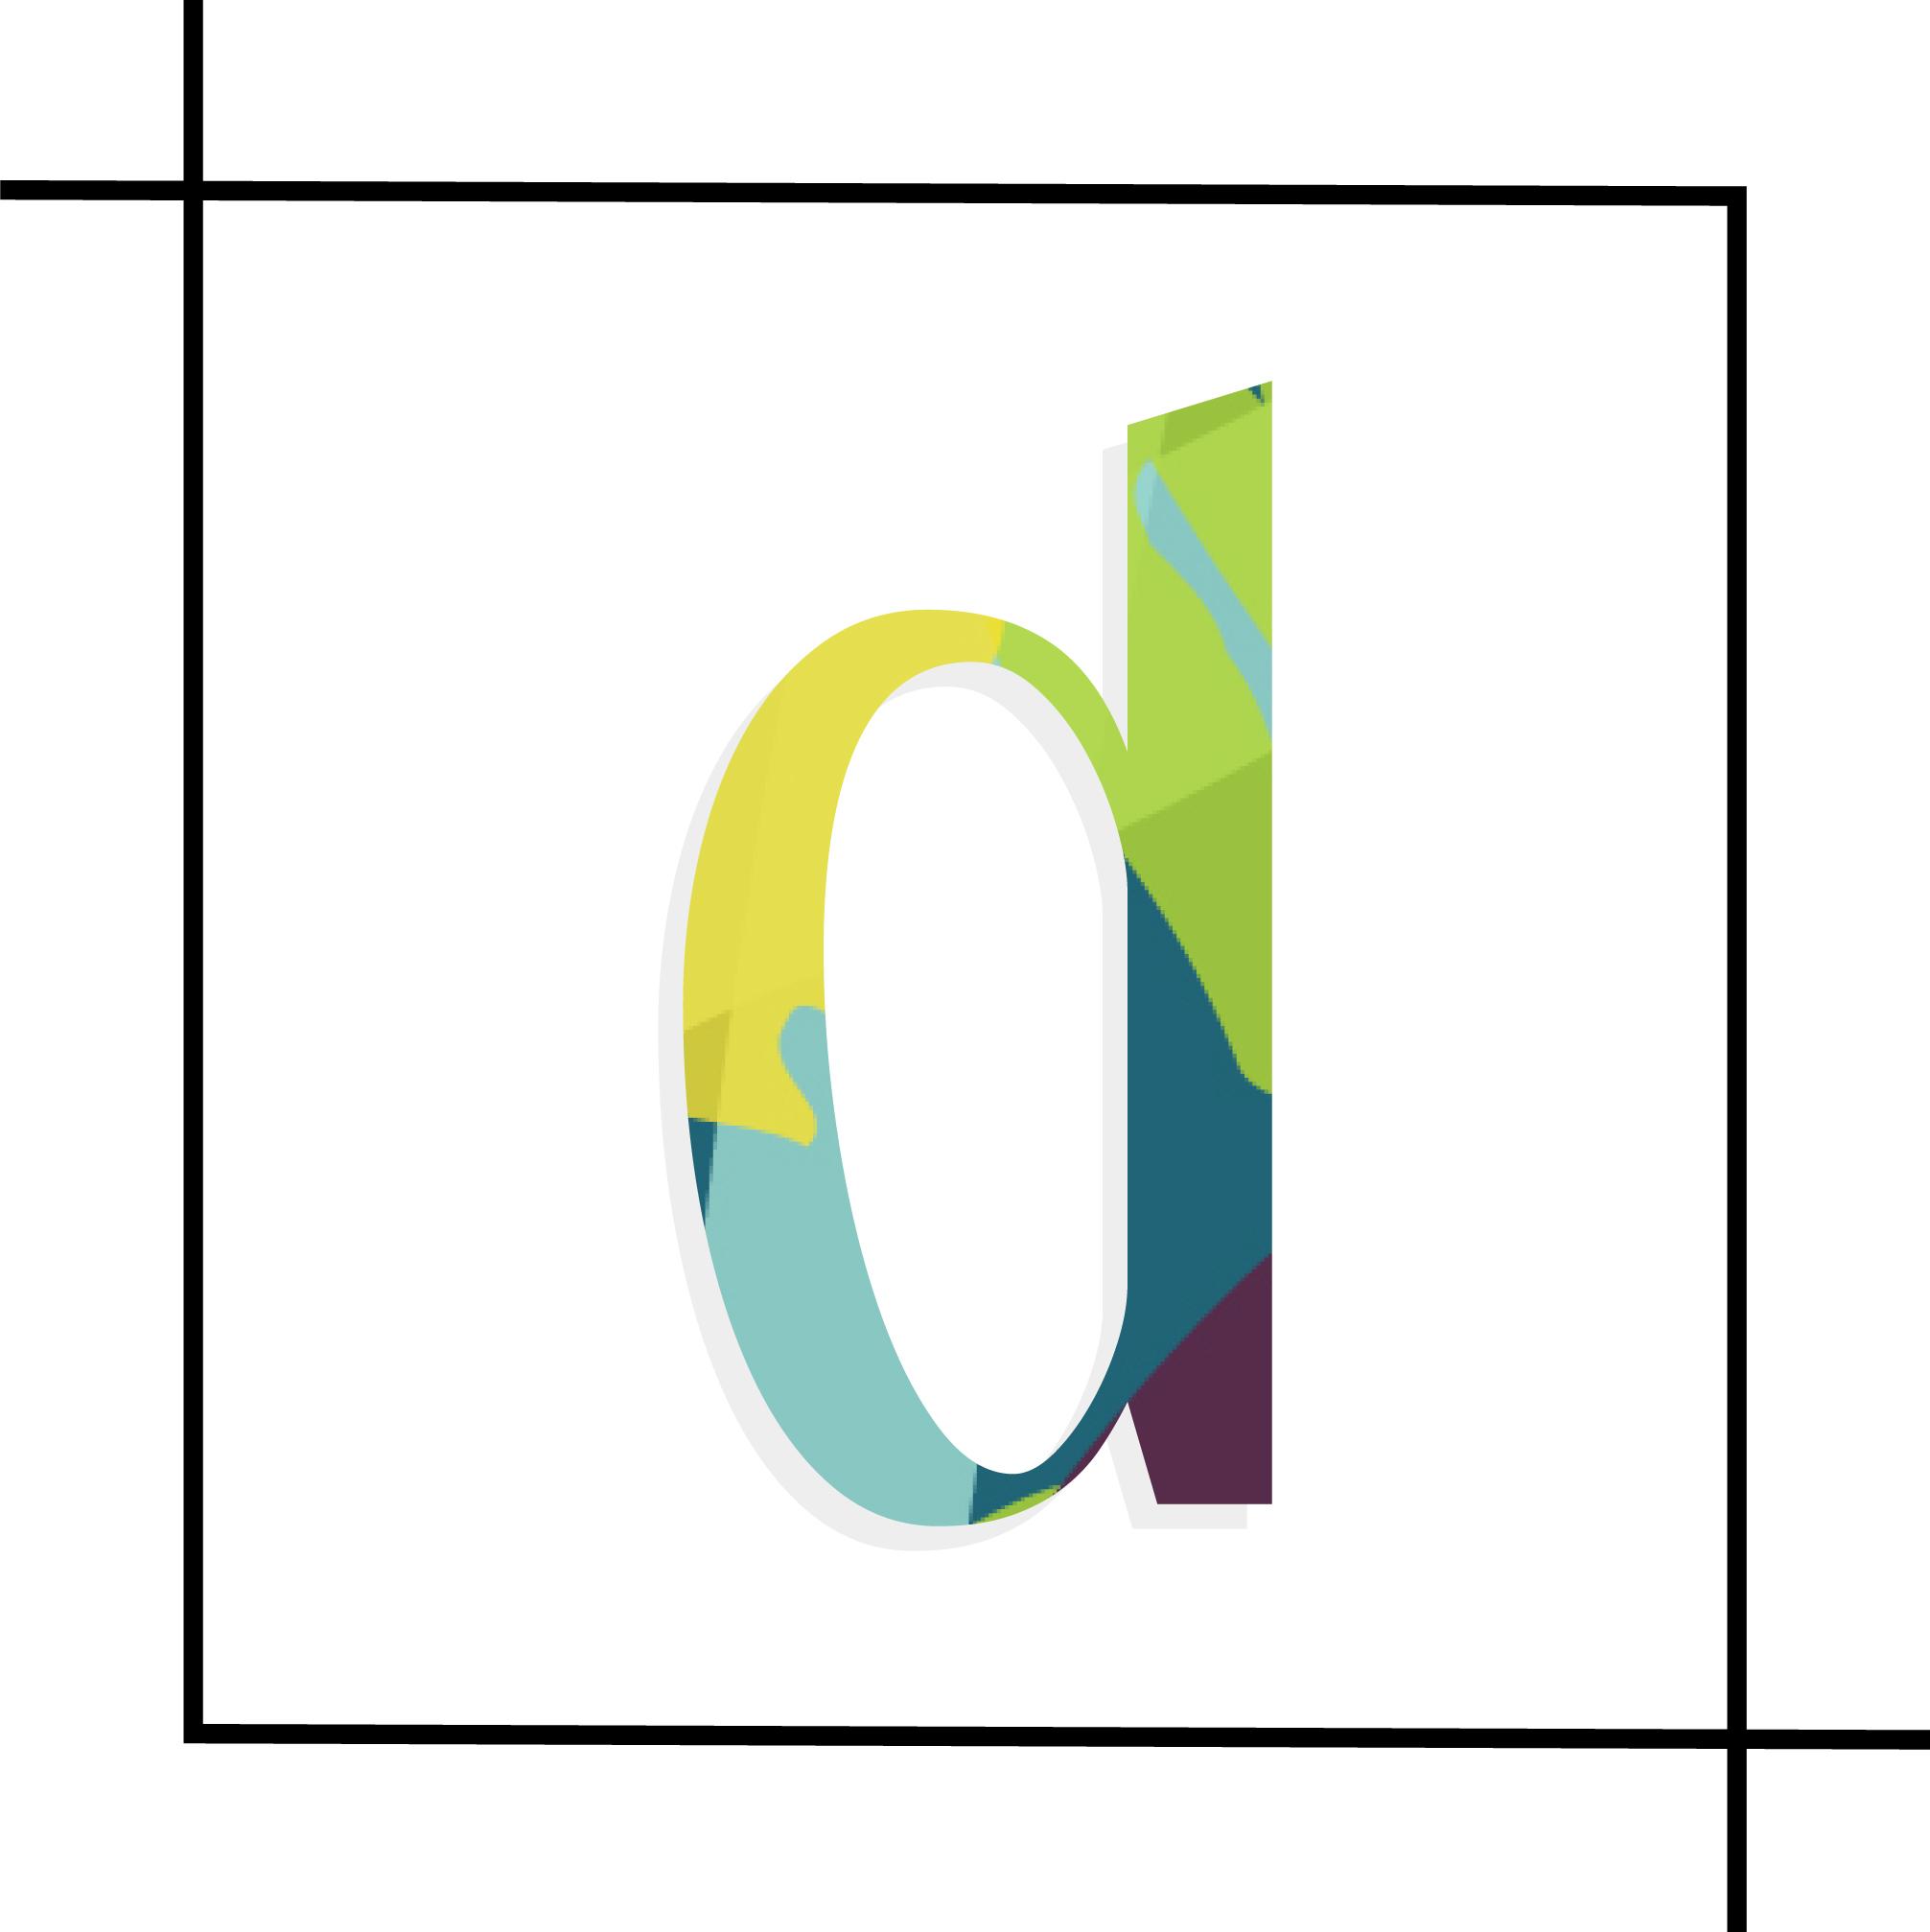 Dotson Course Design Submark #1 | Tiffany Kuehl Designs  #coursedesign #coursecreation #branding #logo #logodesign #brandstylist #branddesigner